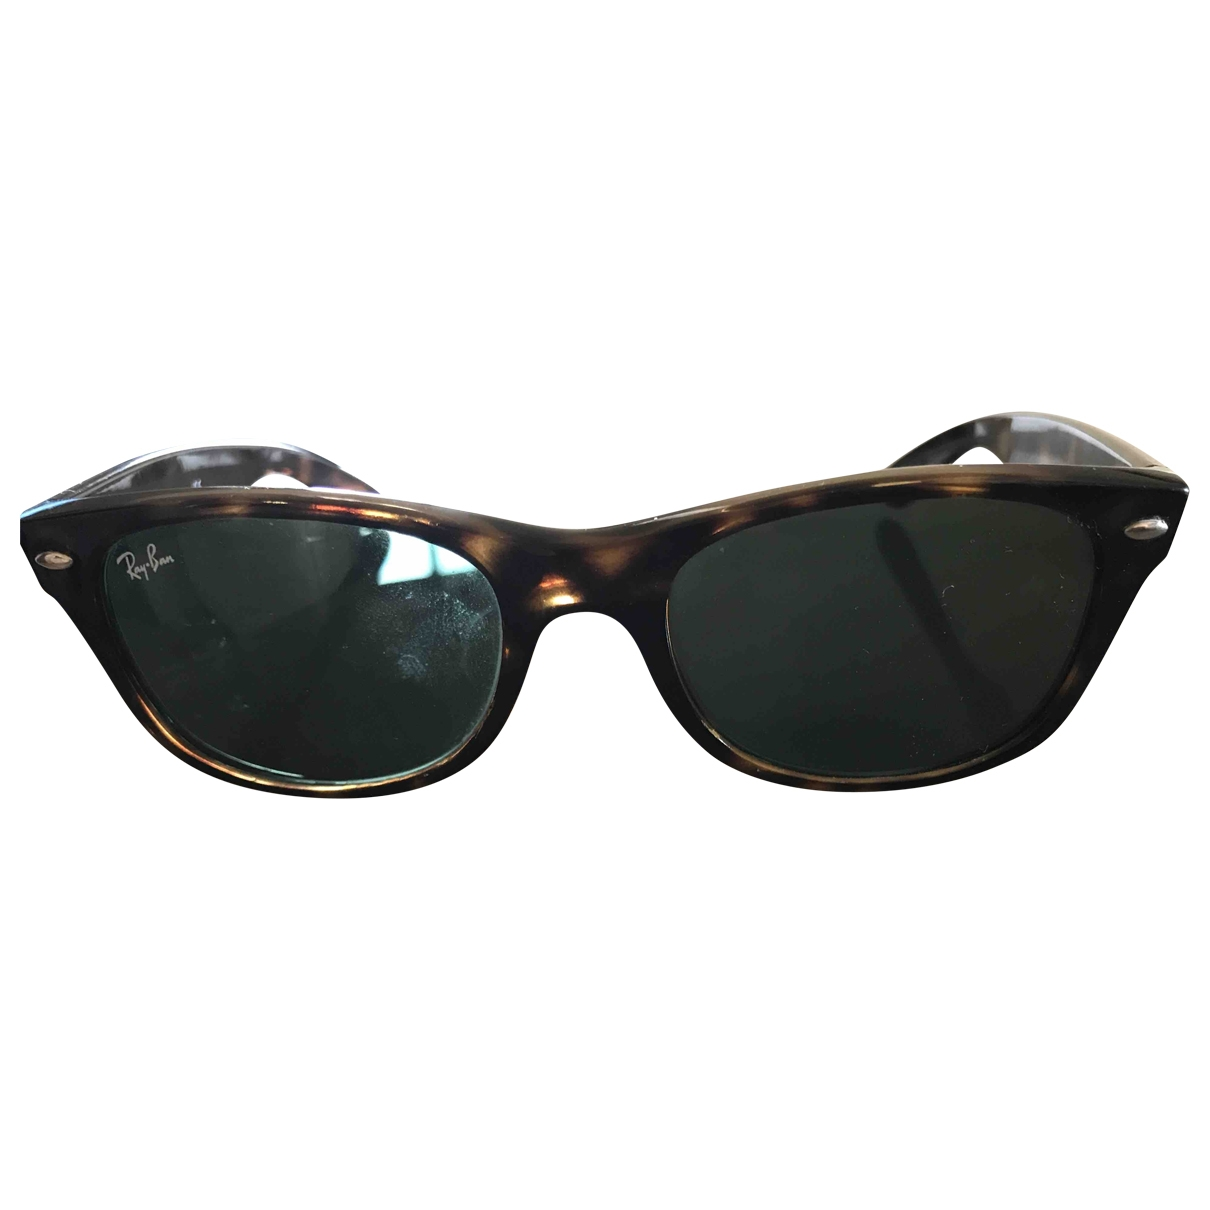 Ray-ban \N Multicolour Sunglasses for Women \N